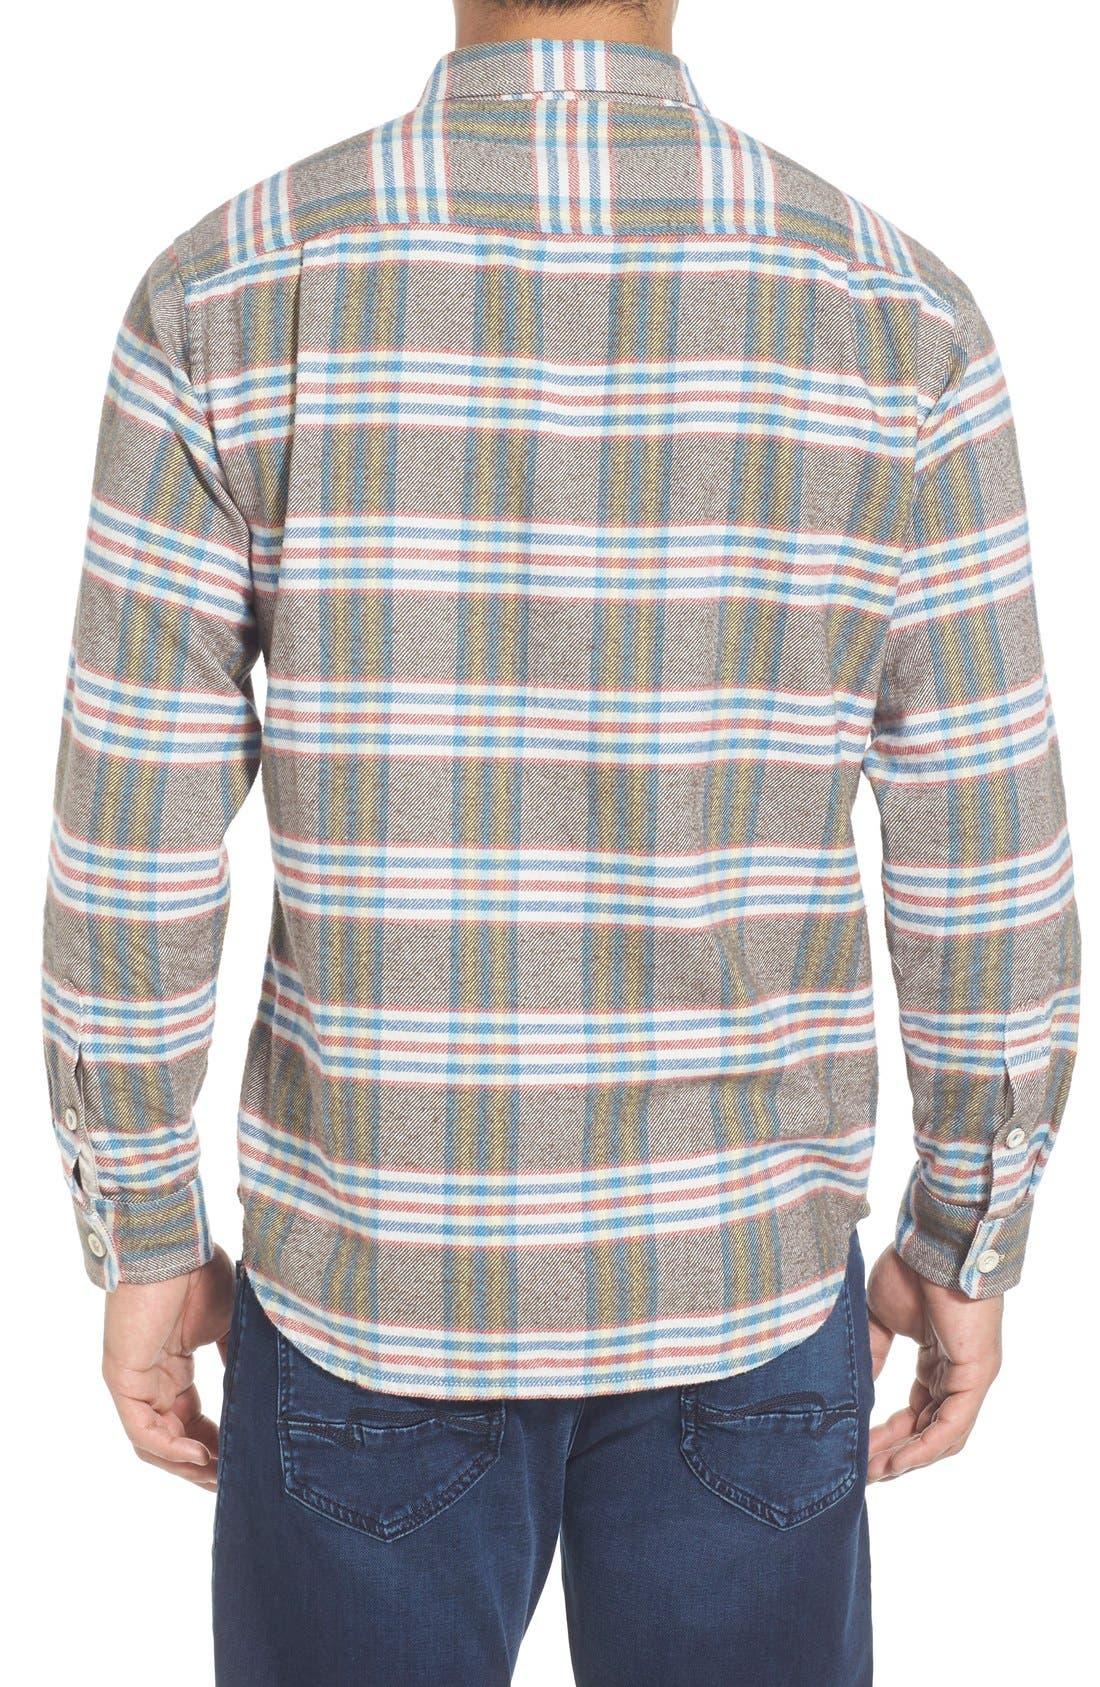 'Flannel Time' Original FitPlaid Flannel Shirt,                             Alternate thumbnail 4, color,                             200